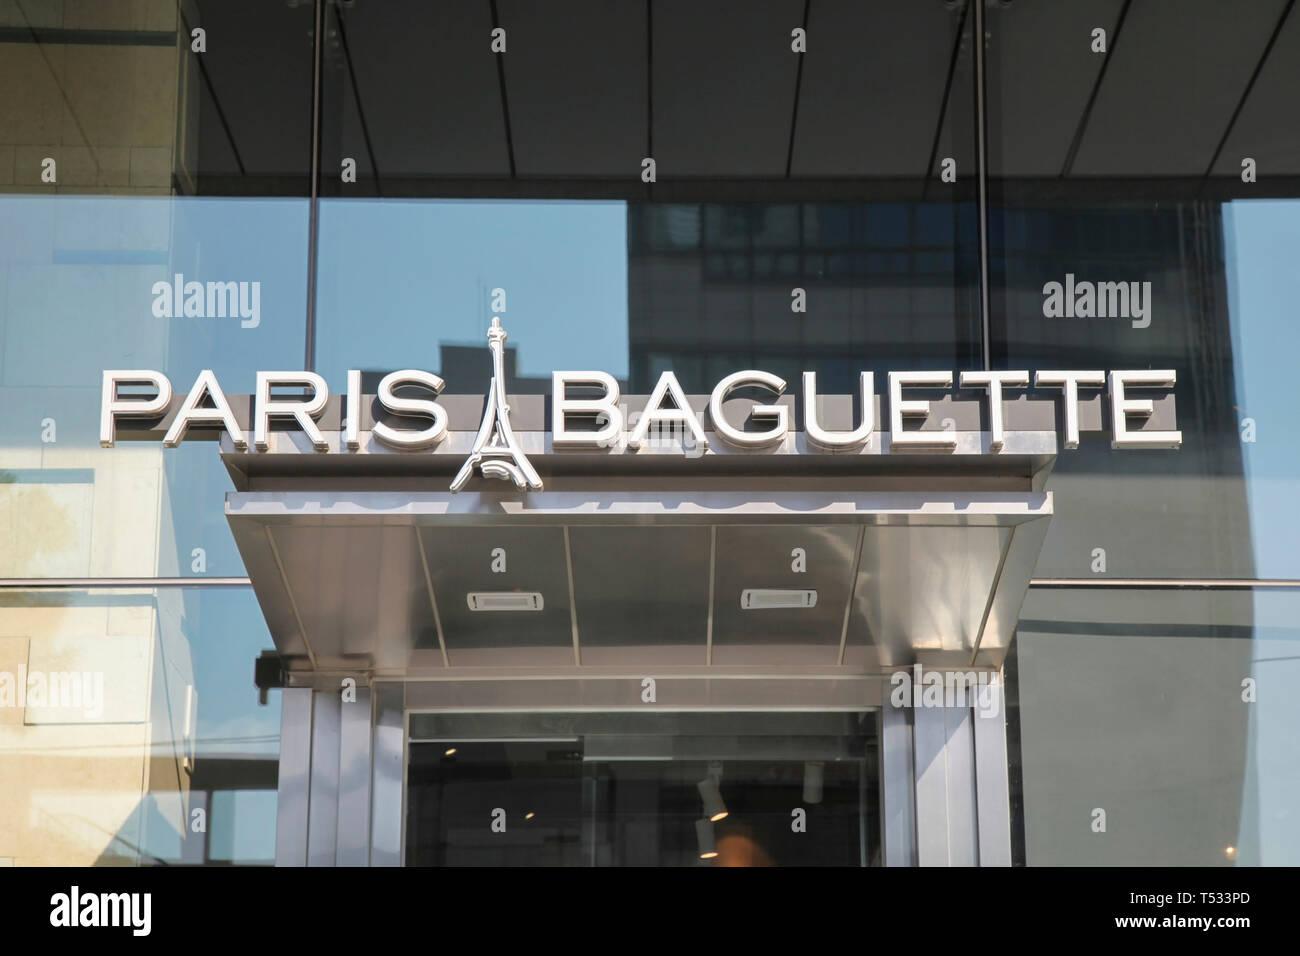 Entrance Sign Of Paris Baguette In Seoul South Korea Paris Baguette Is A Popular Bakery Cafe Franchise Brand In South Korea Stock Photo Alamy